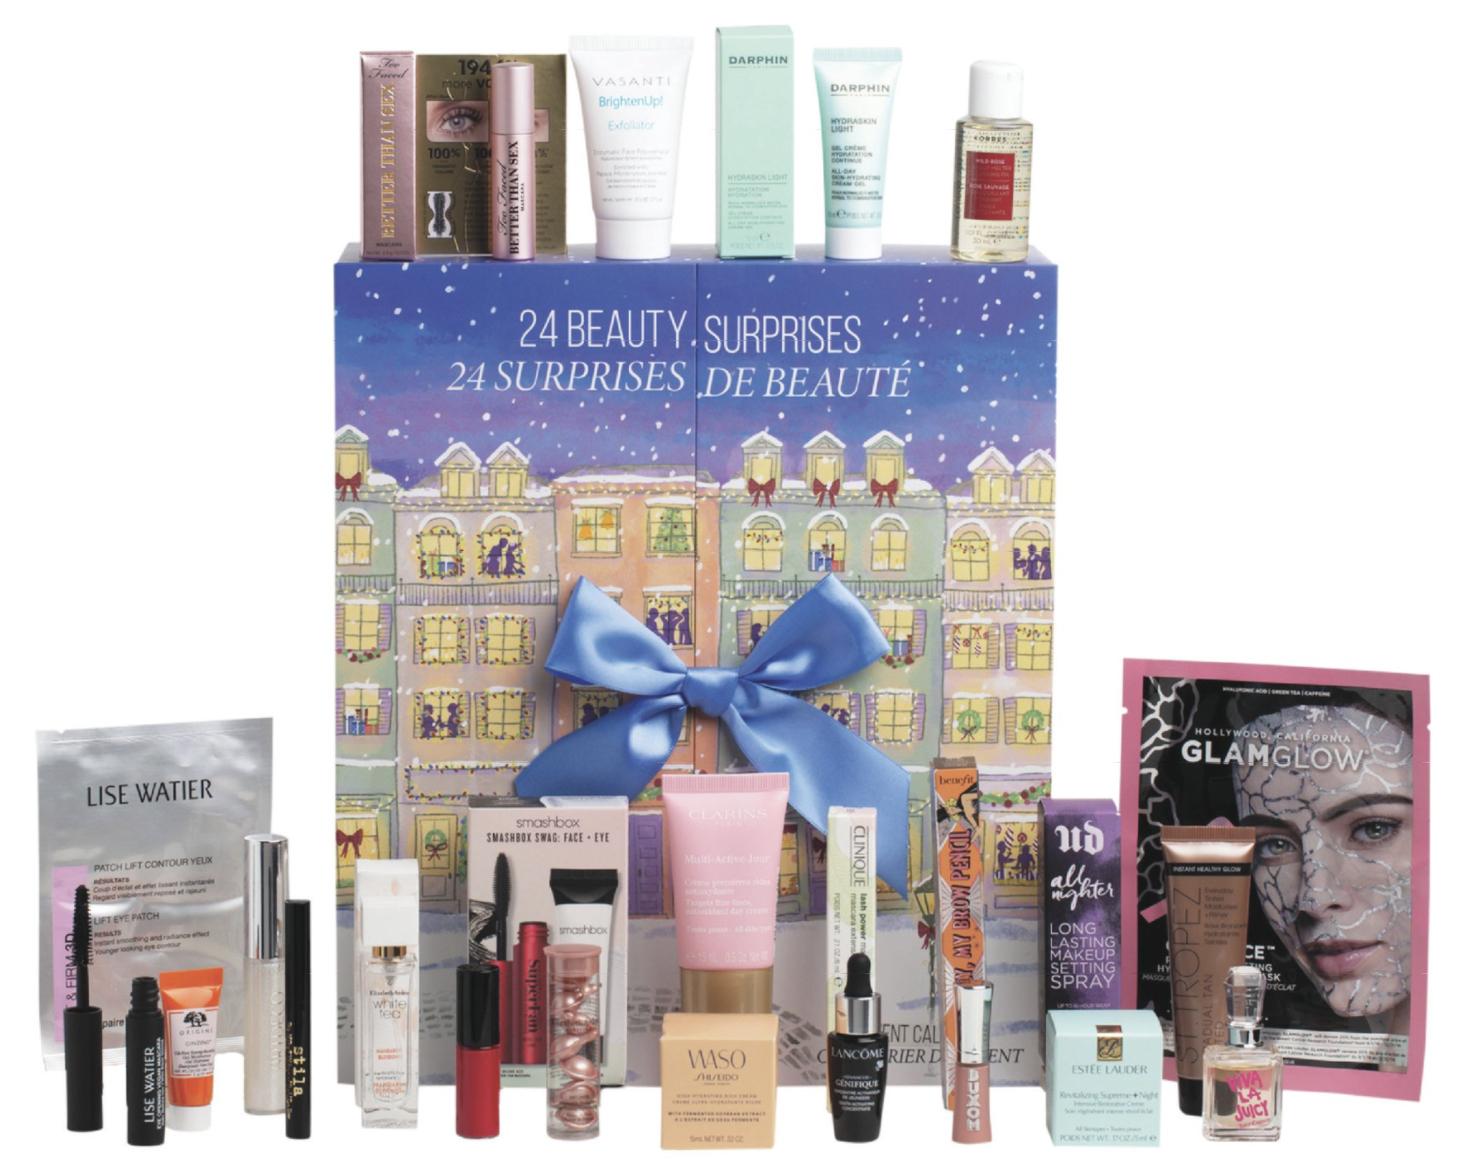 Shoppers Drug Mart Canada: Beauty Boutique 2020 Prestige regarding Shoppers Photo Calendar